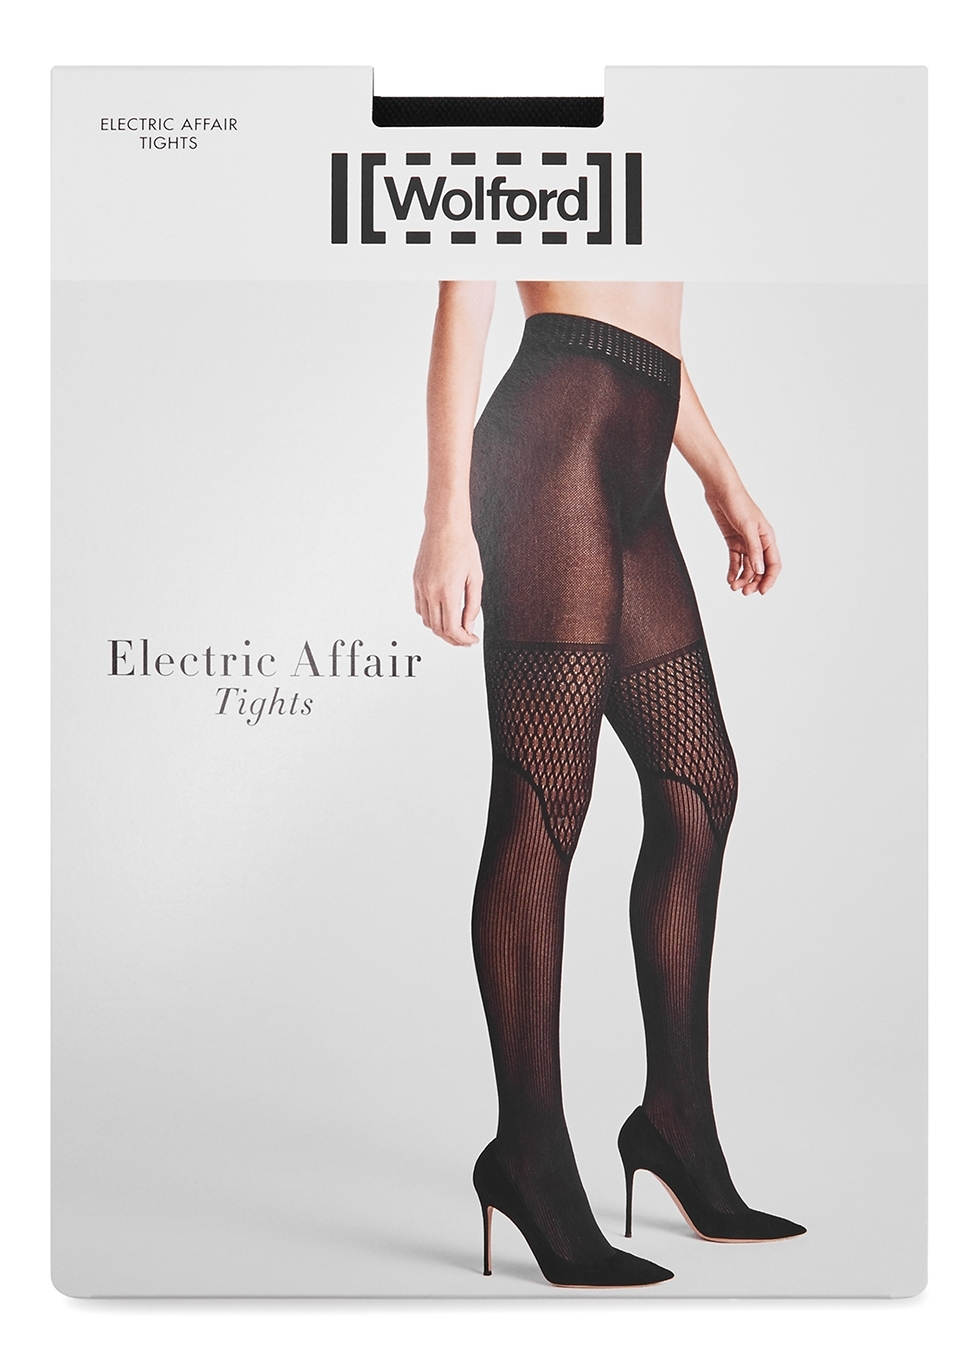 0d593e7aec8 Women s Designer Hosiery - Tights